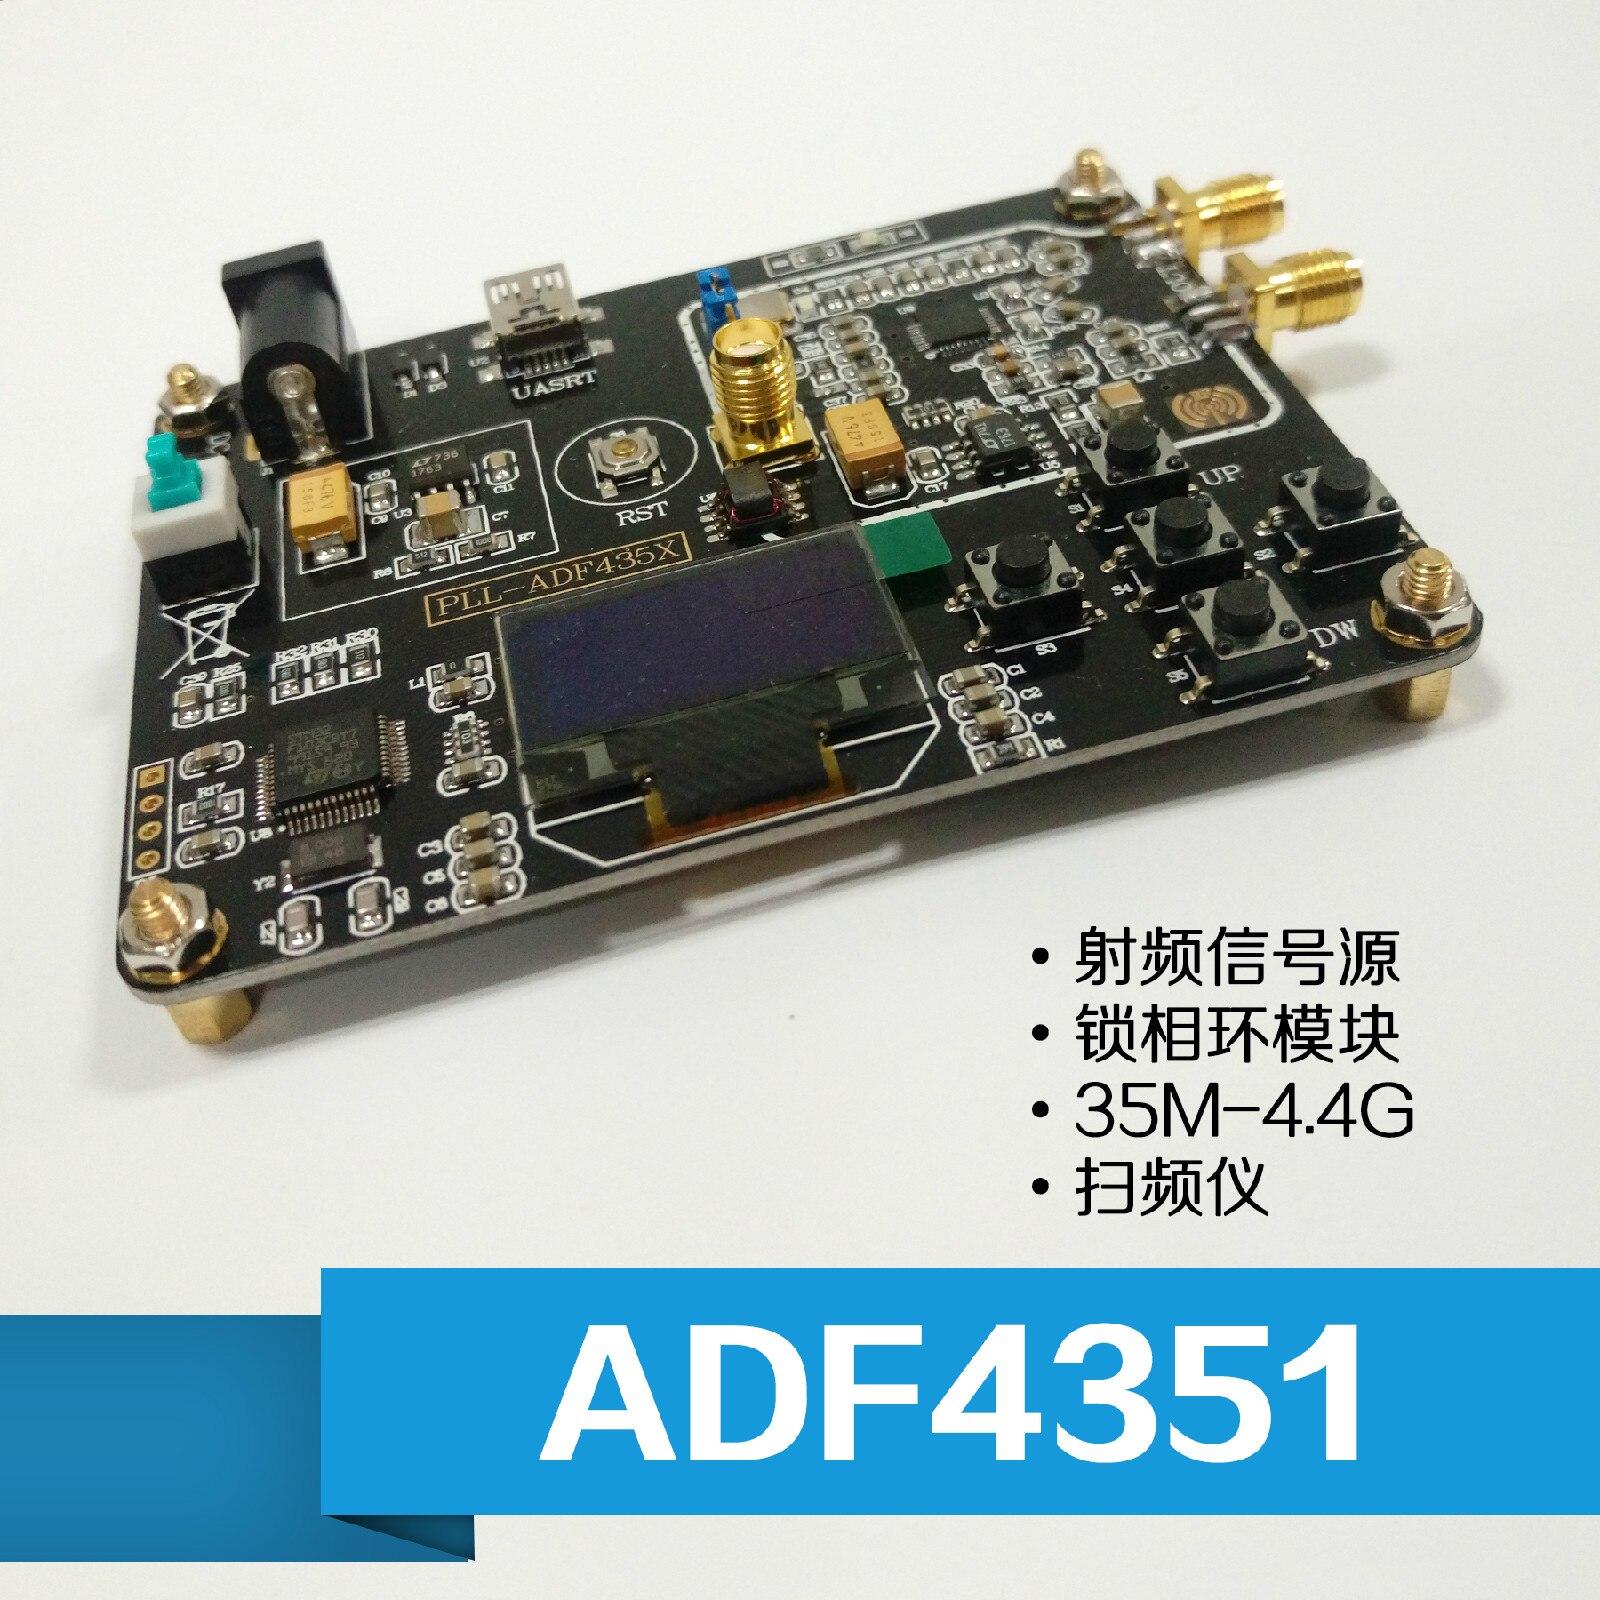 ADF4351 Board STM32 Single Chip Phase-locked Loop Module 35M-4.4G RF Signal Source SweeperADF4351 Board STM32 Single Chip Phase-locked Loop Module 35M-4.4G RF Signal Source Sweeper